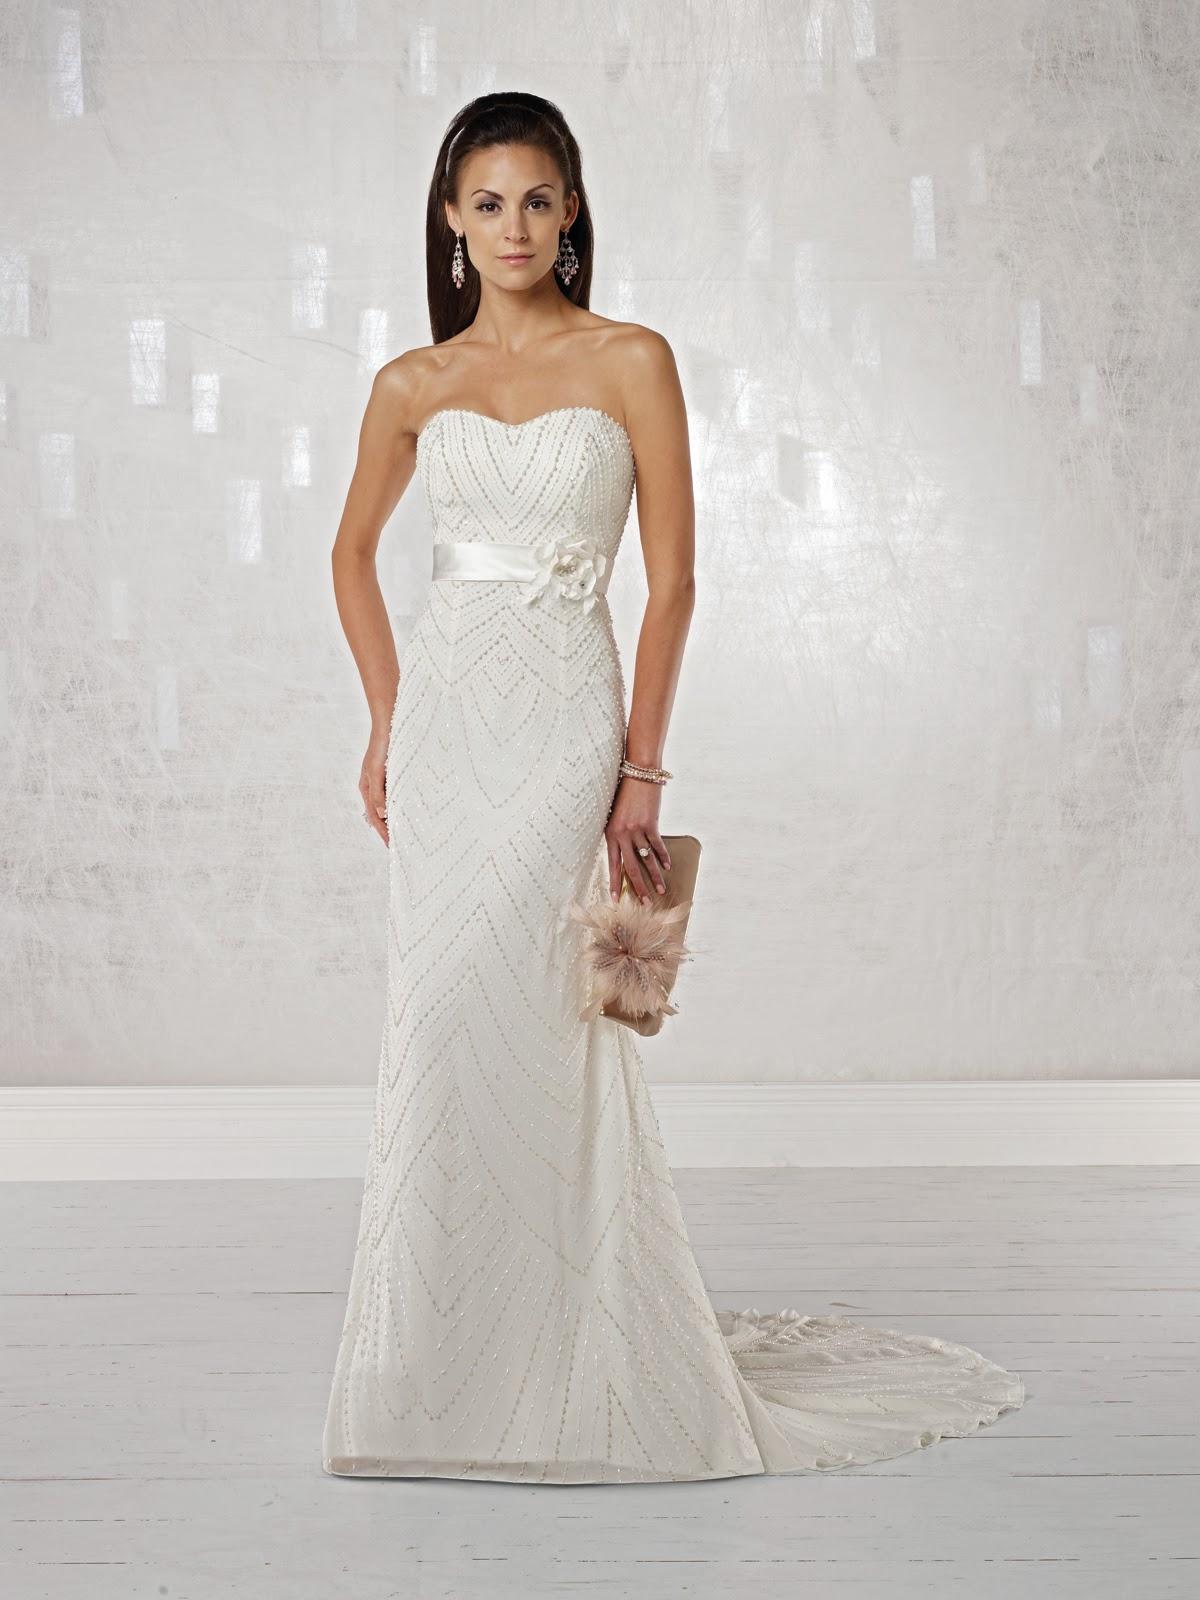 Modas de vestidos de novia sencillos